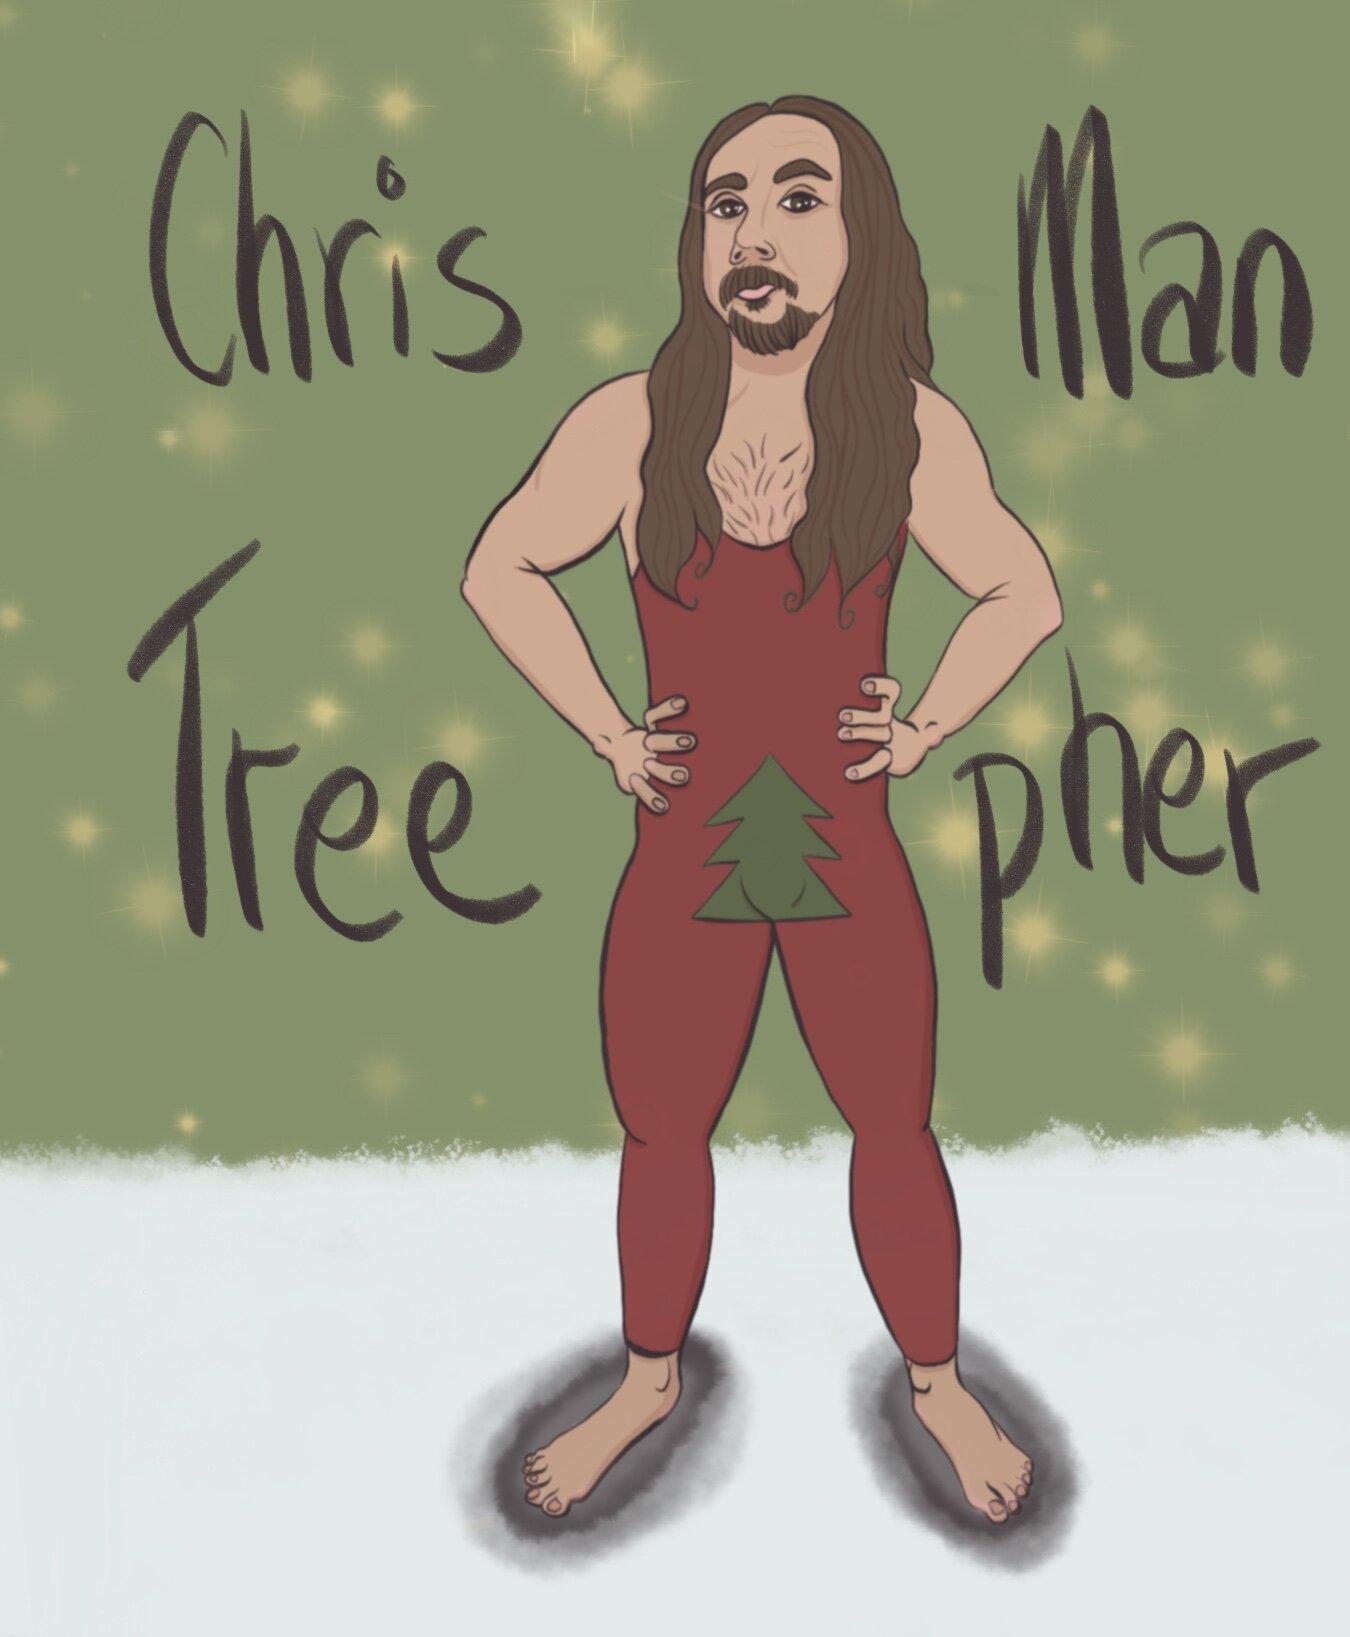 Chrisman_Treepher_Zine.jpg